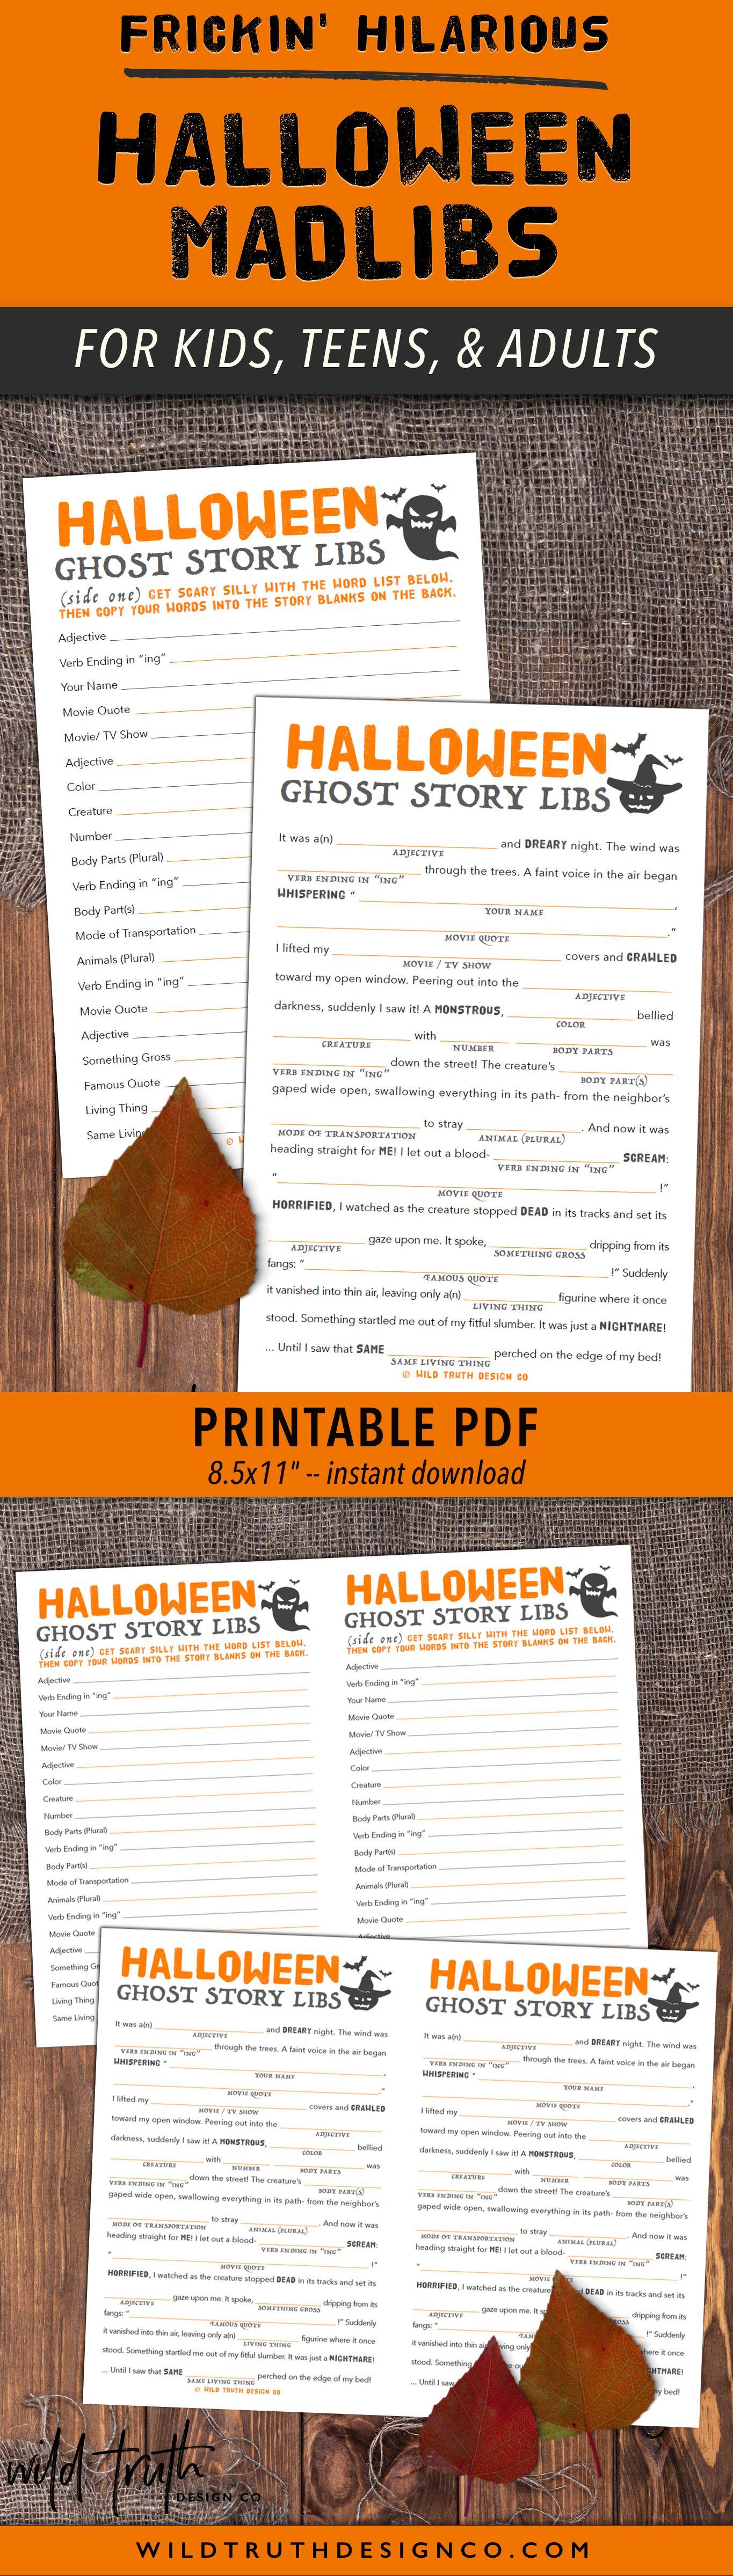 Printable Mad Libs Halloween Story For Kids Tweens